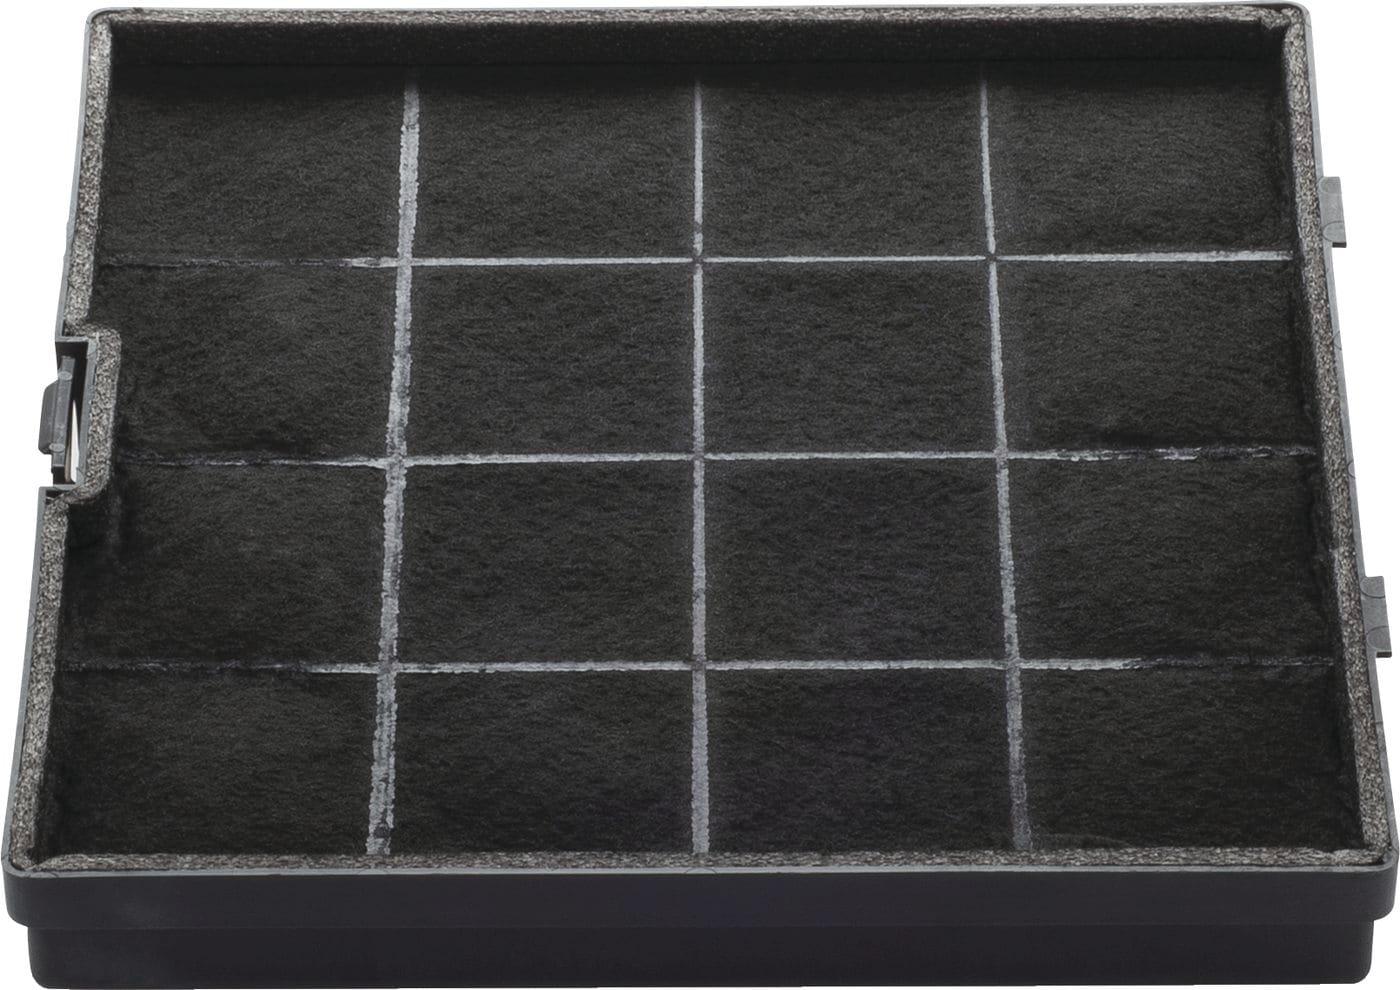 "Frigidaire 8.5"" x 9"" Charcoal Range Hood Filter"